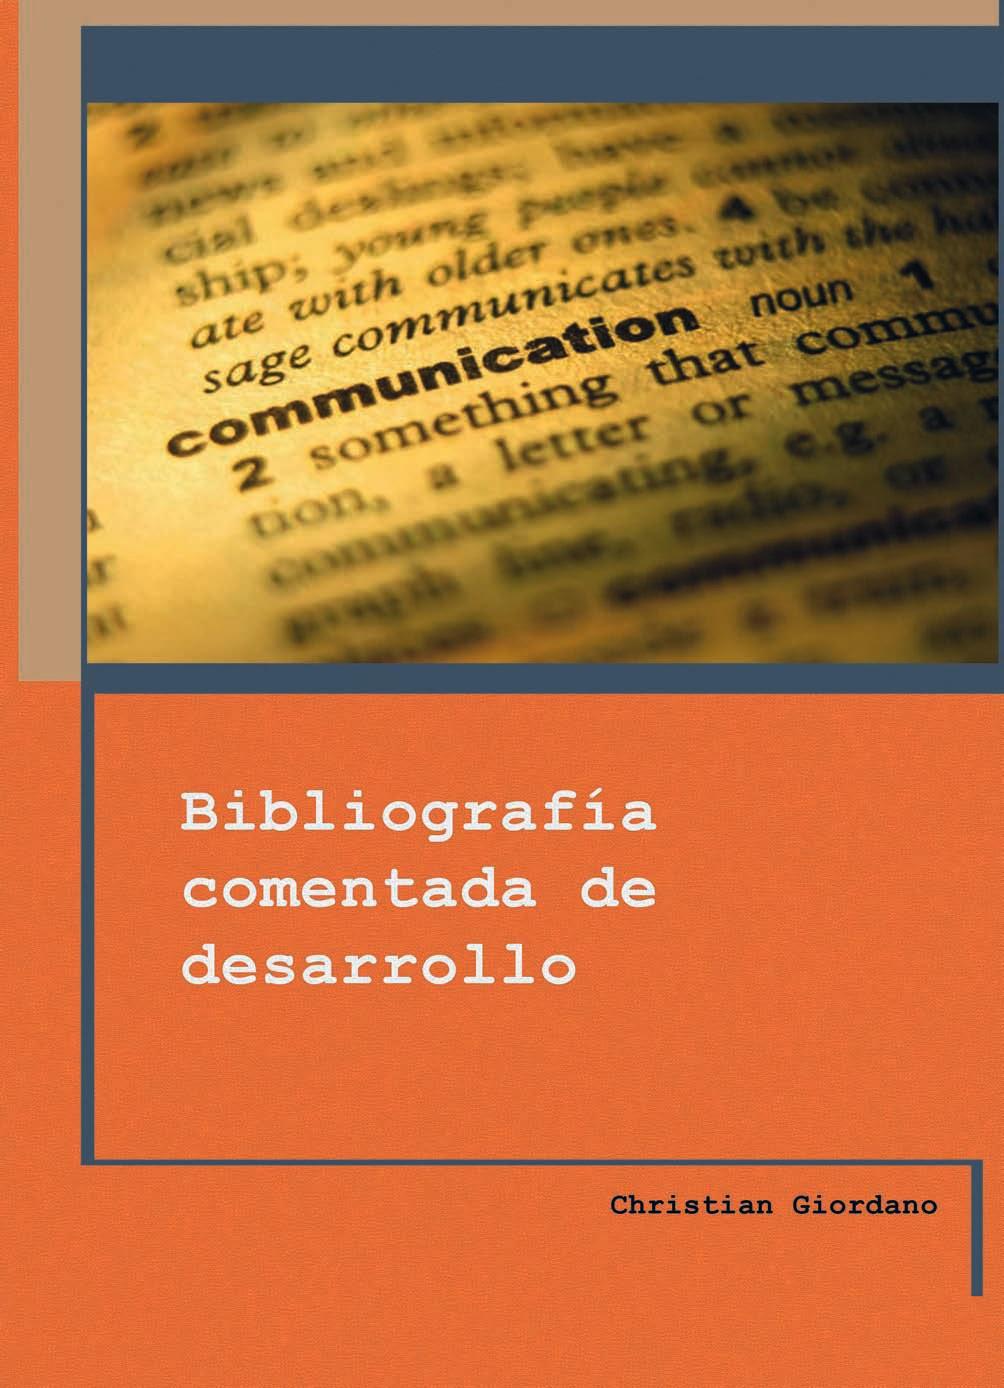 Christian Giordano-Bibliografía Comentada De Desarrollo-